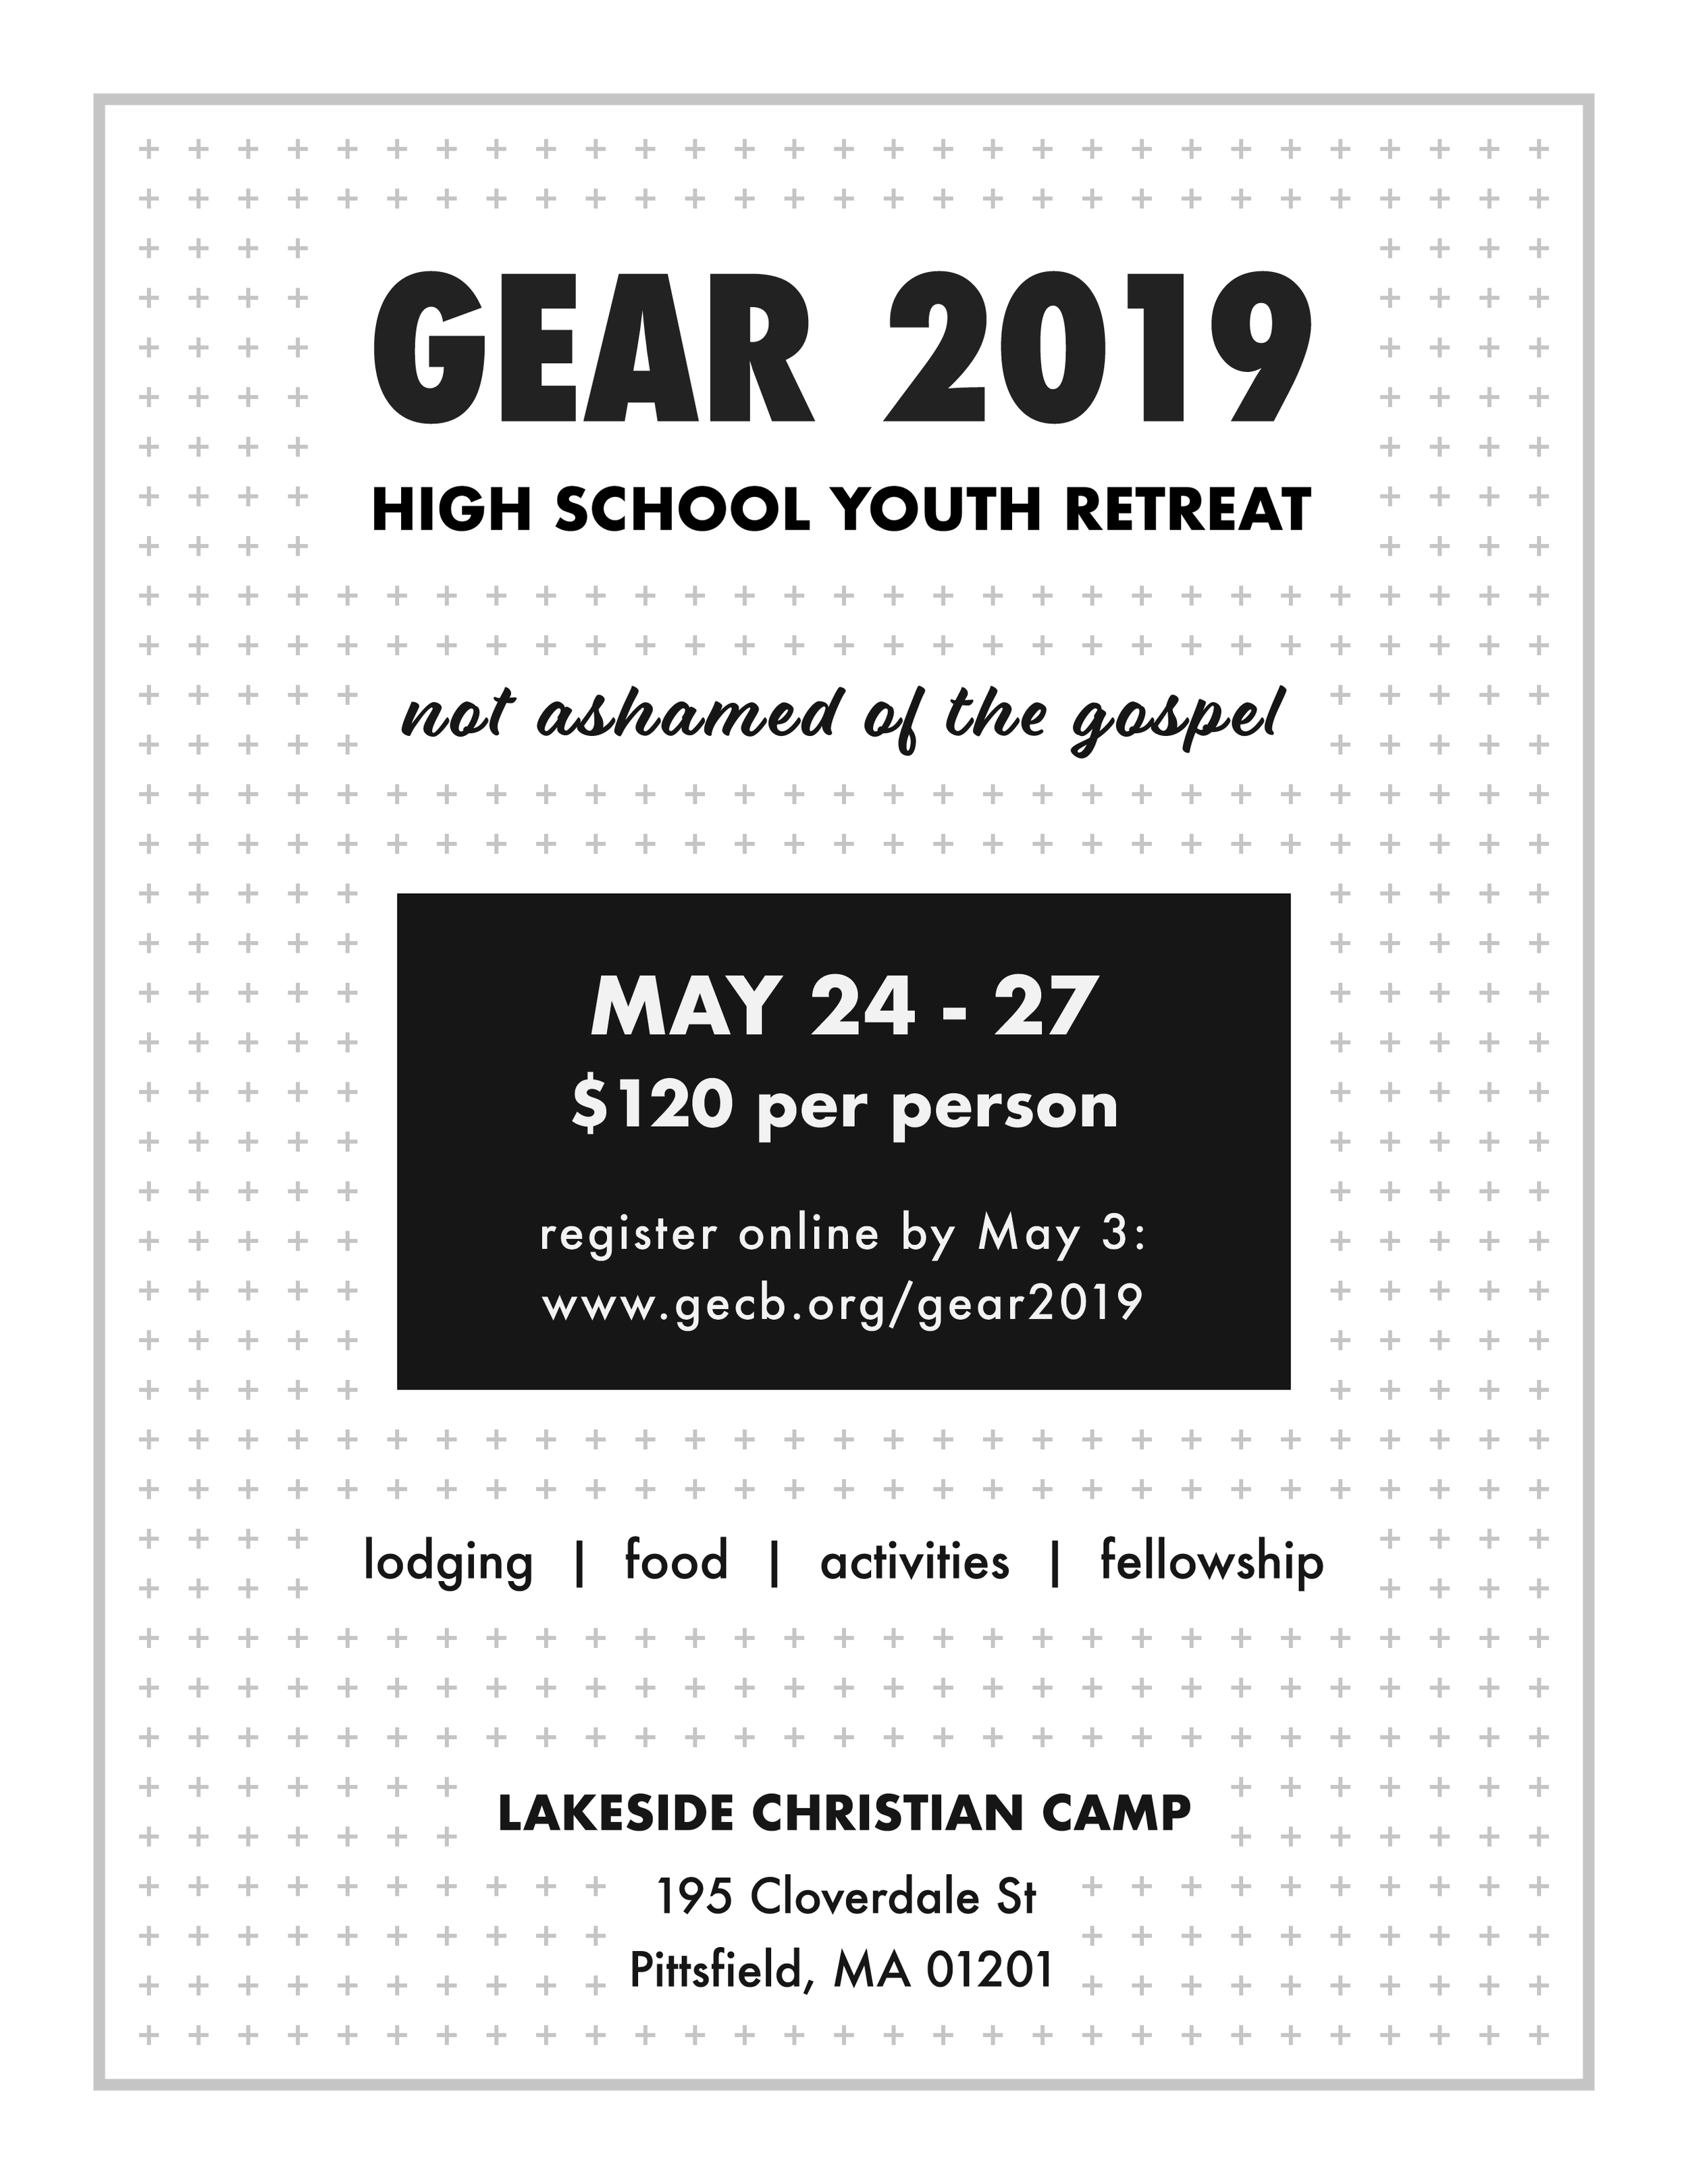 GEAR Flyer 2019-01.png